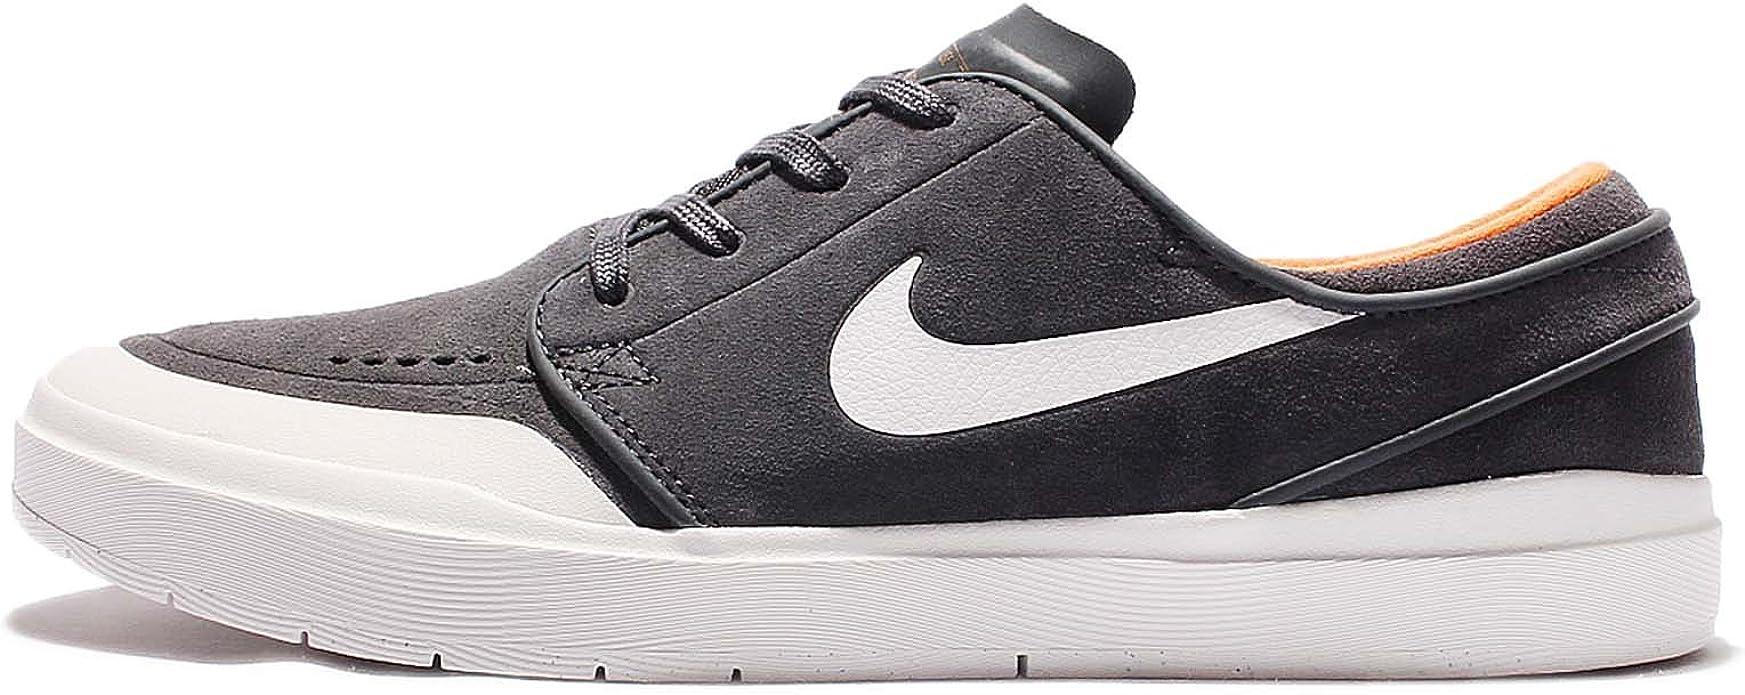 Credencial regional sociedad  Nike SB Hyperfeel Stefan Janoski XT Anthracite/White-Summit White Skate  Shoes-Men 10.0, Women 11.5: Amazon.ca: Sports & Outdoors